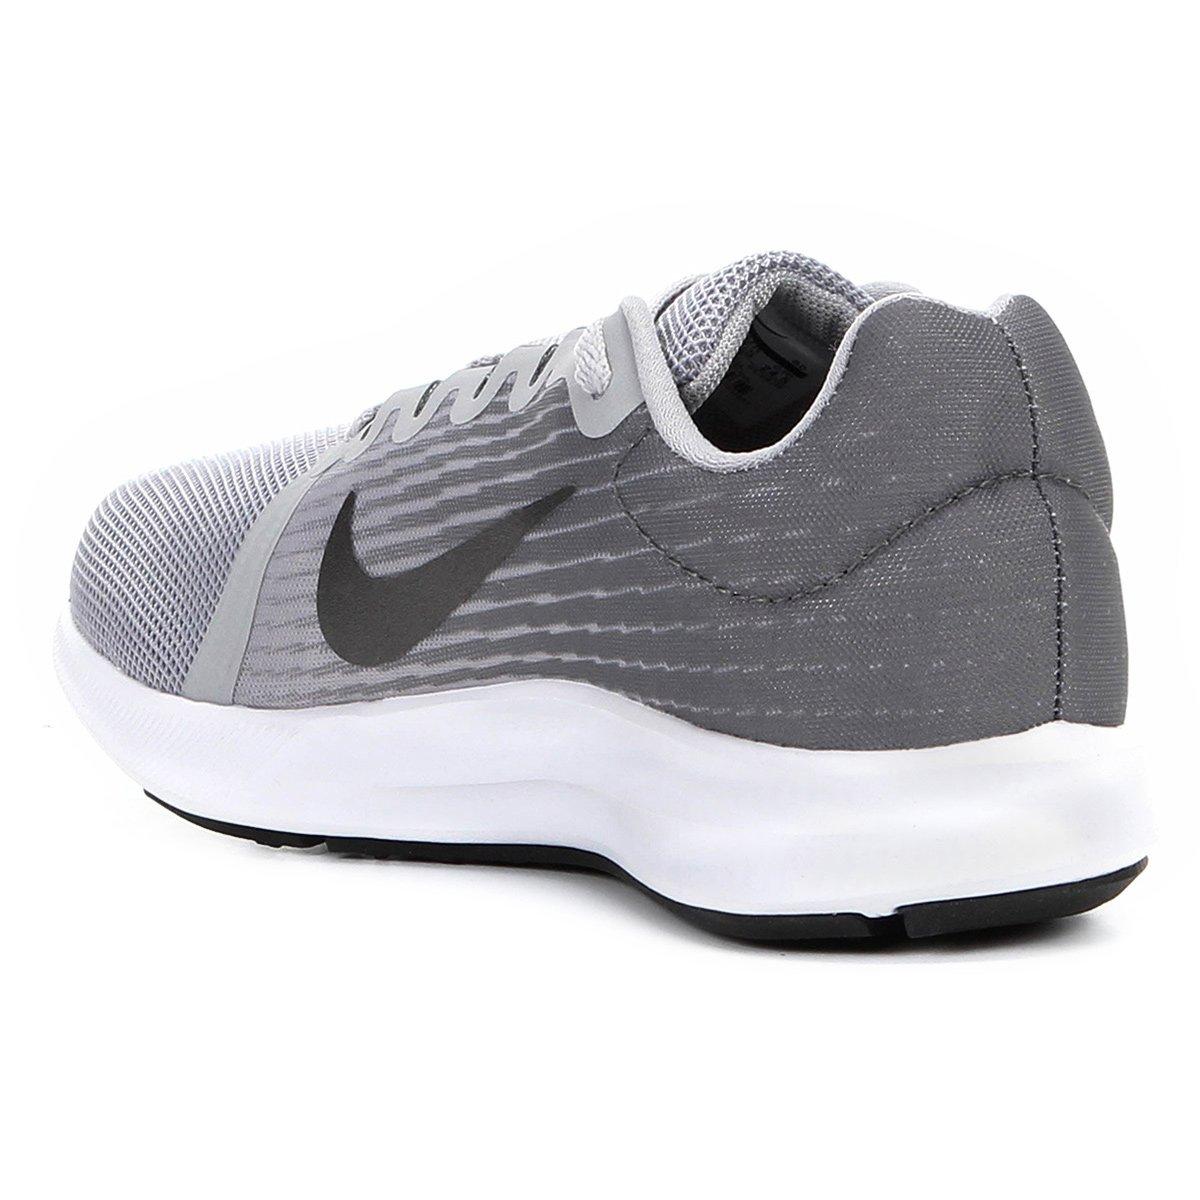 Tênis Nike Wmns Downshifter 8 Feminino Cinza E Preto